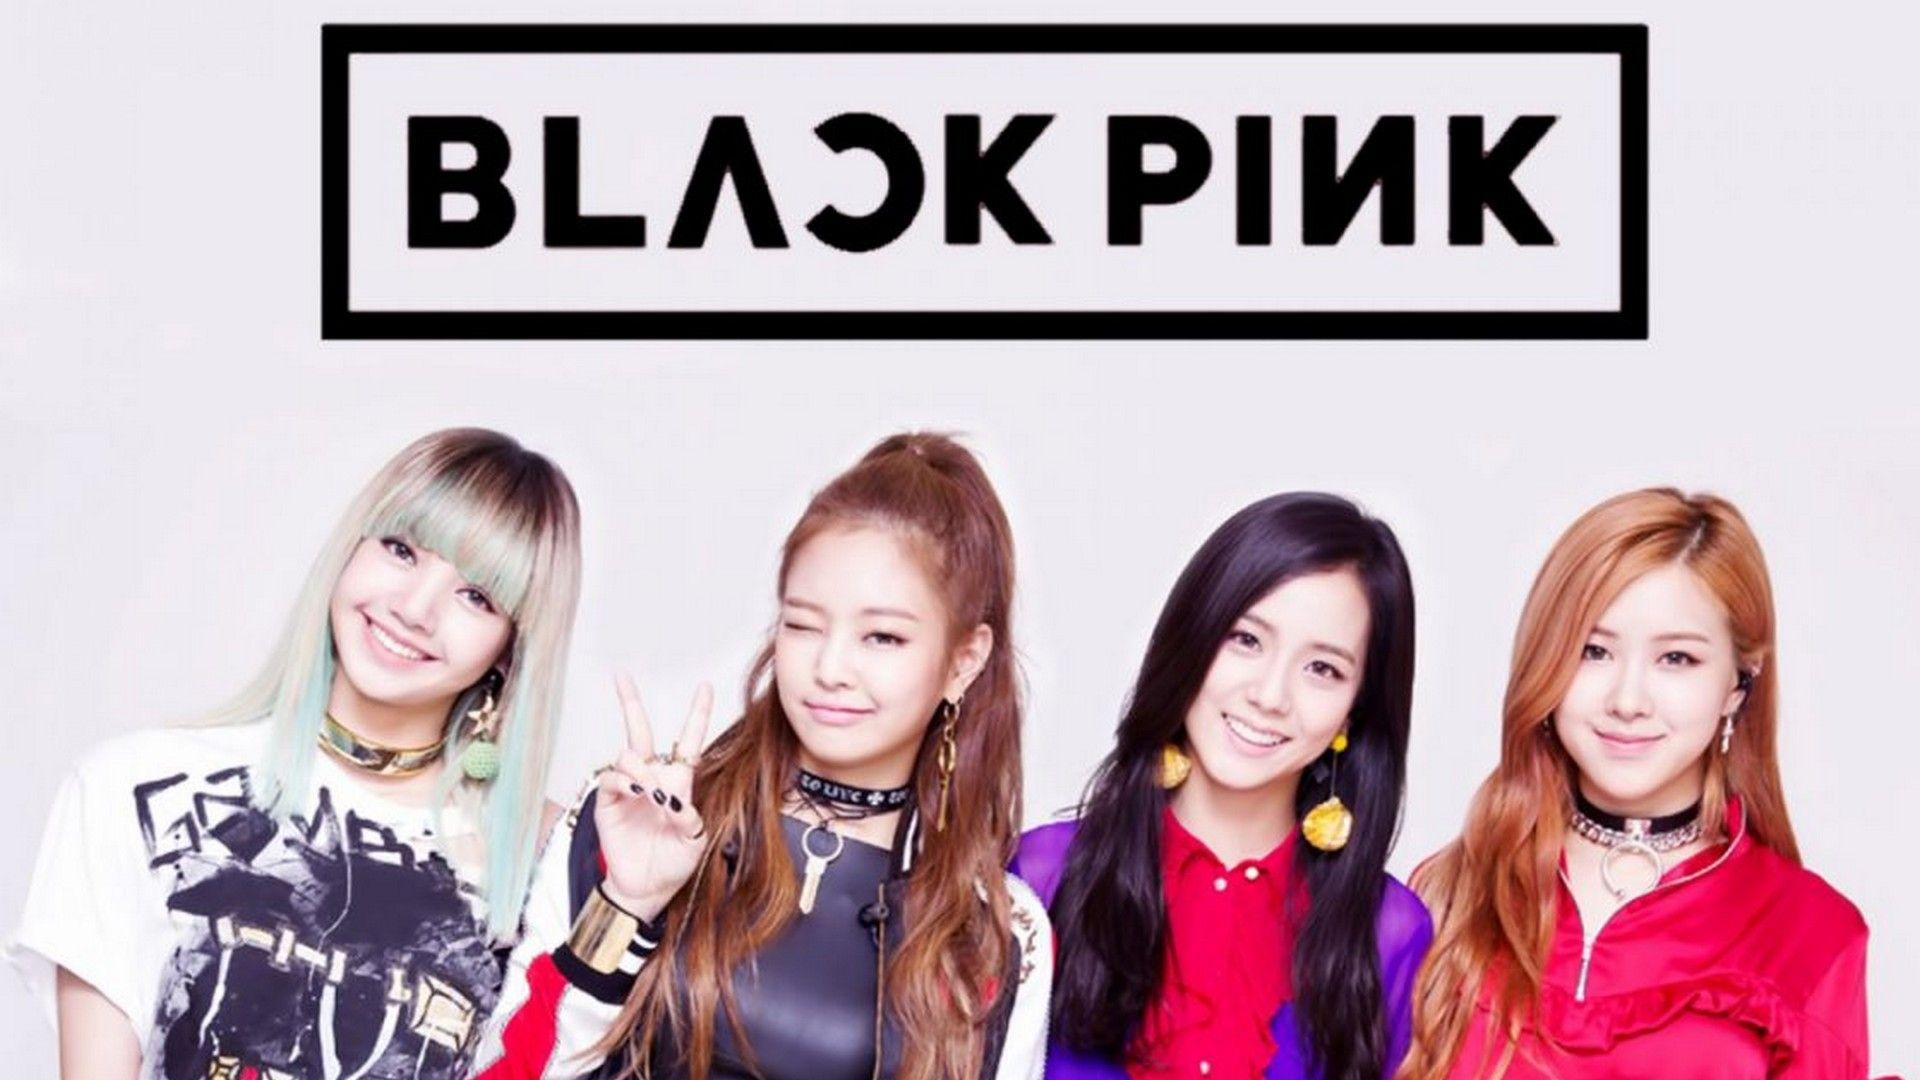 Blackpink Wallpaper Best Wallpaper Hd Best Wallpaper Hd Blackpink Black Pink Kpop